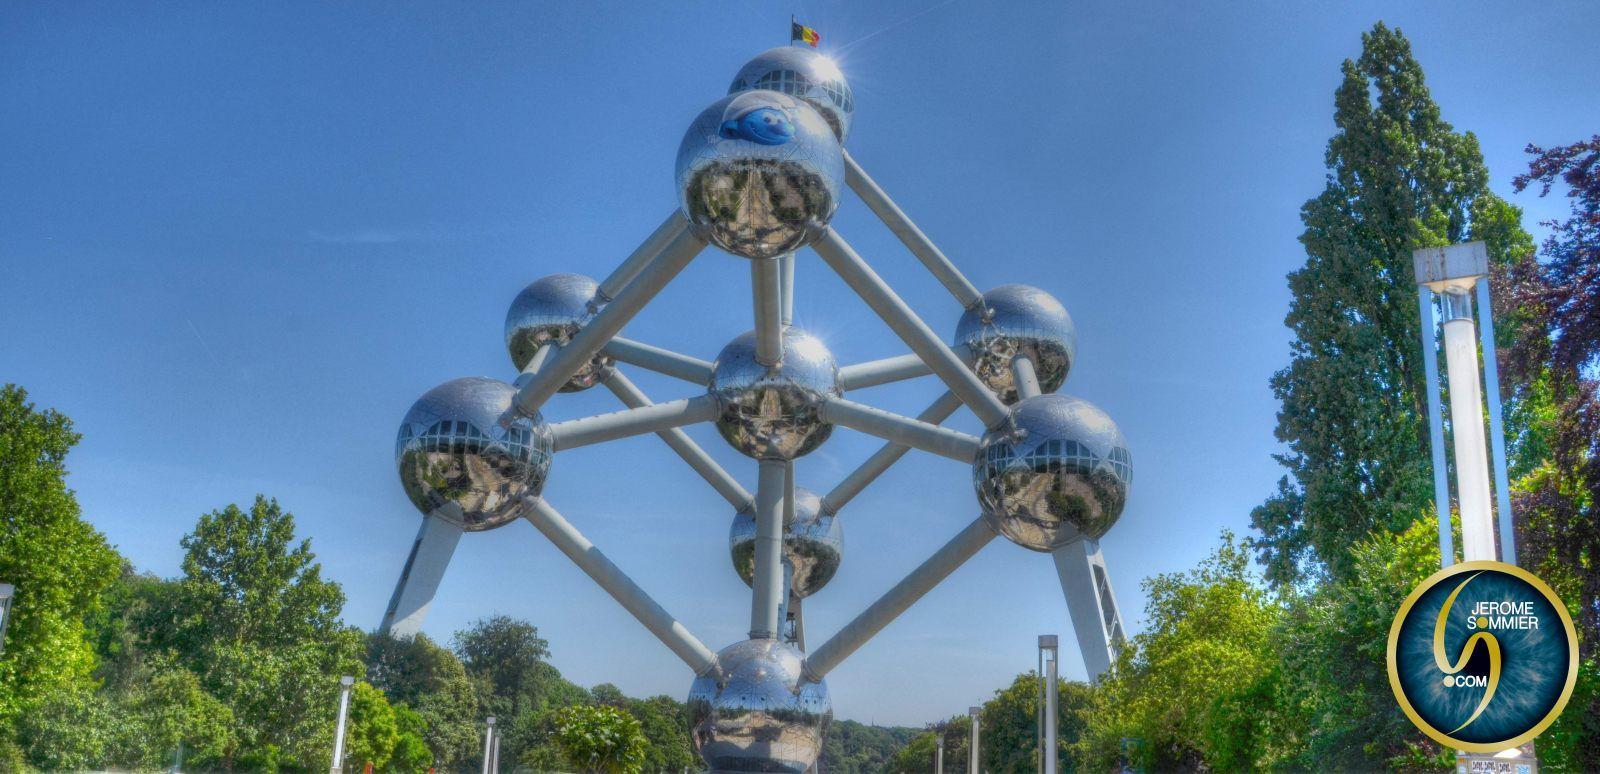 Jerome Sommier Photos - Travel & Events: Bruxelles